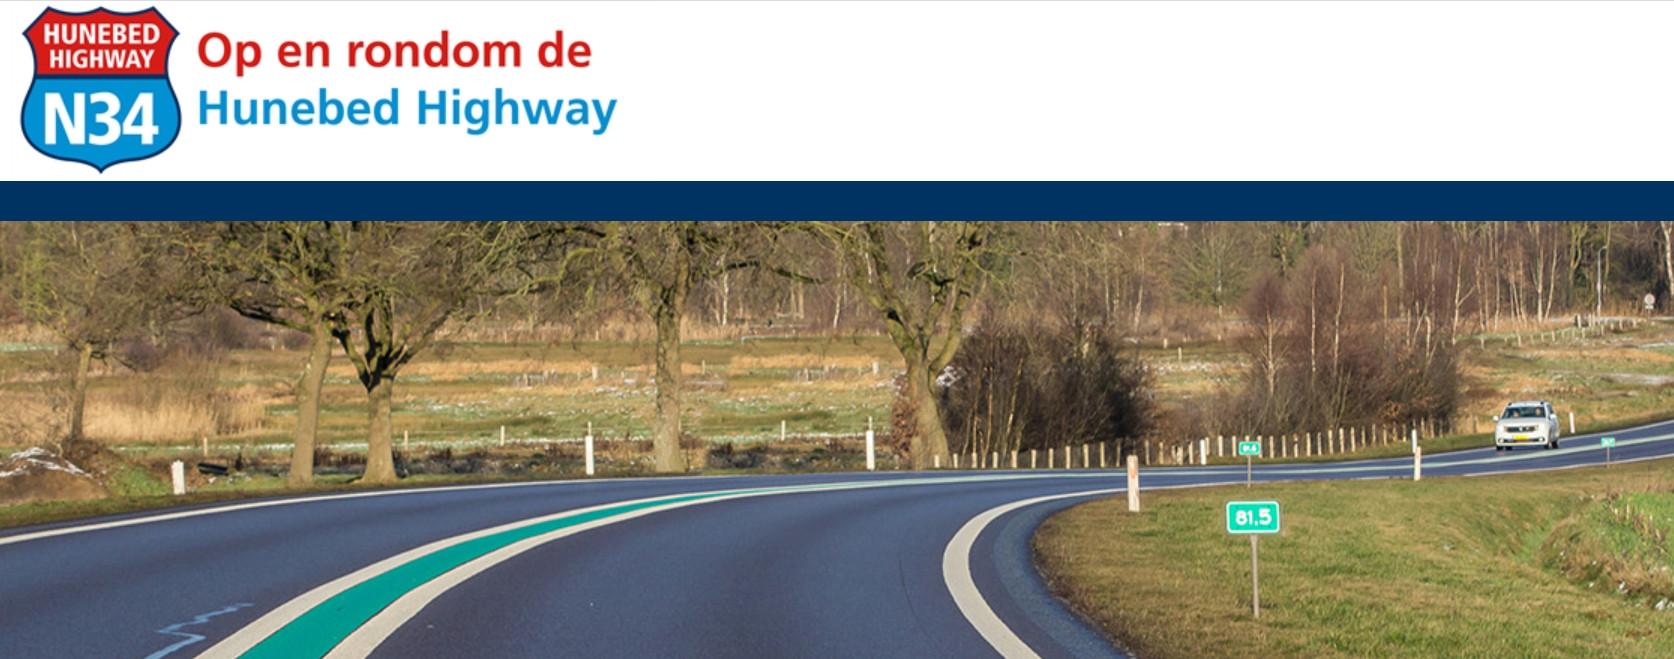 Hunebed Highway - Drenthe